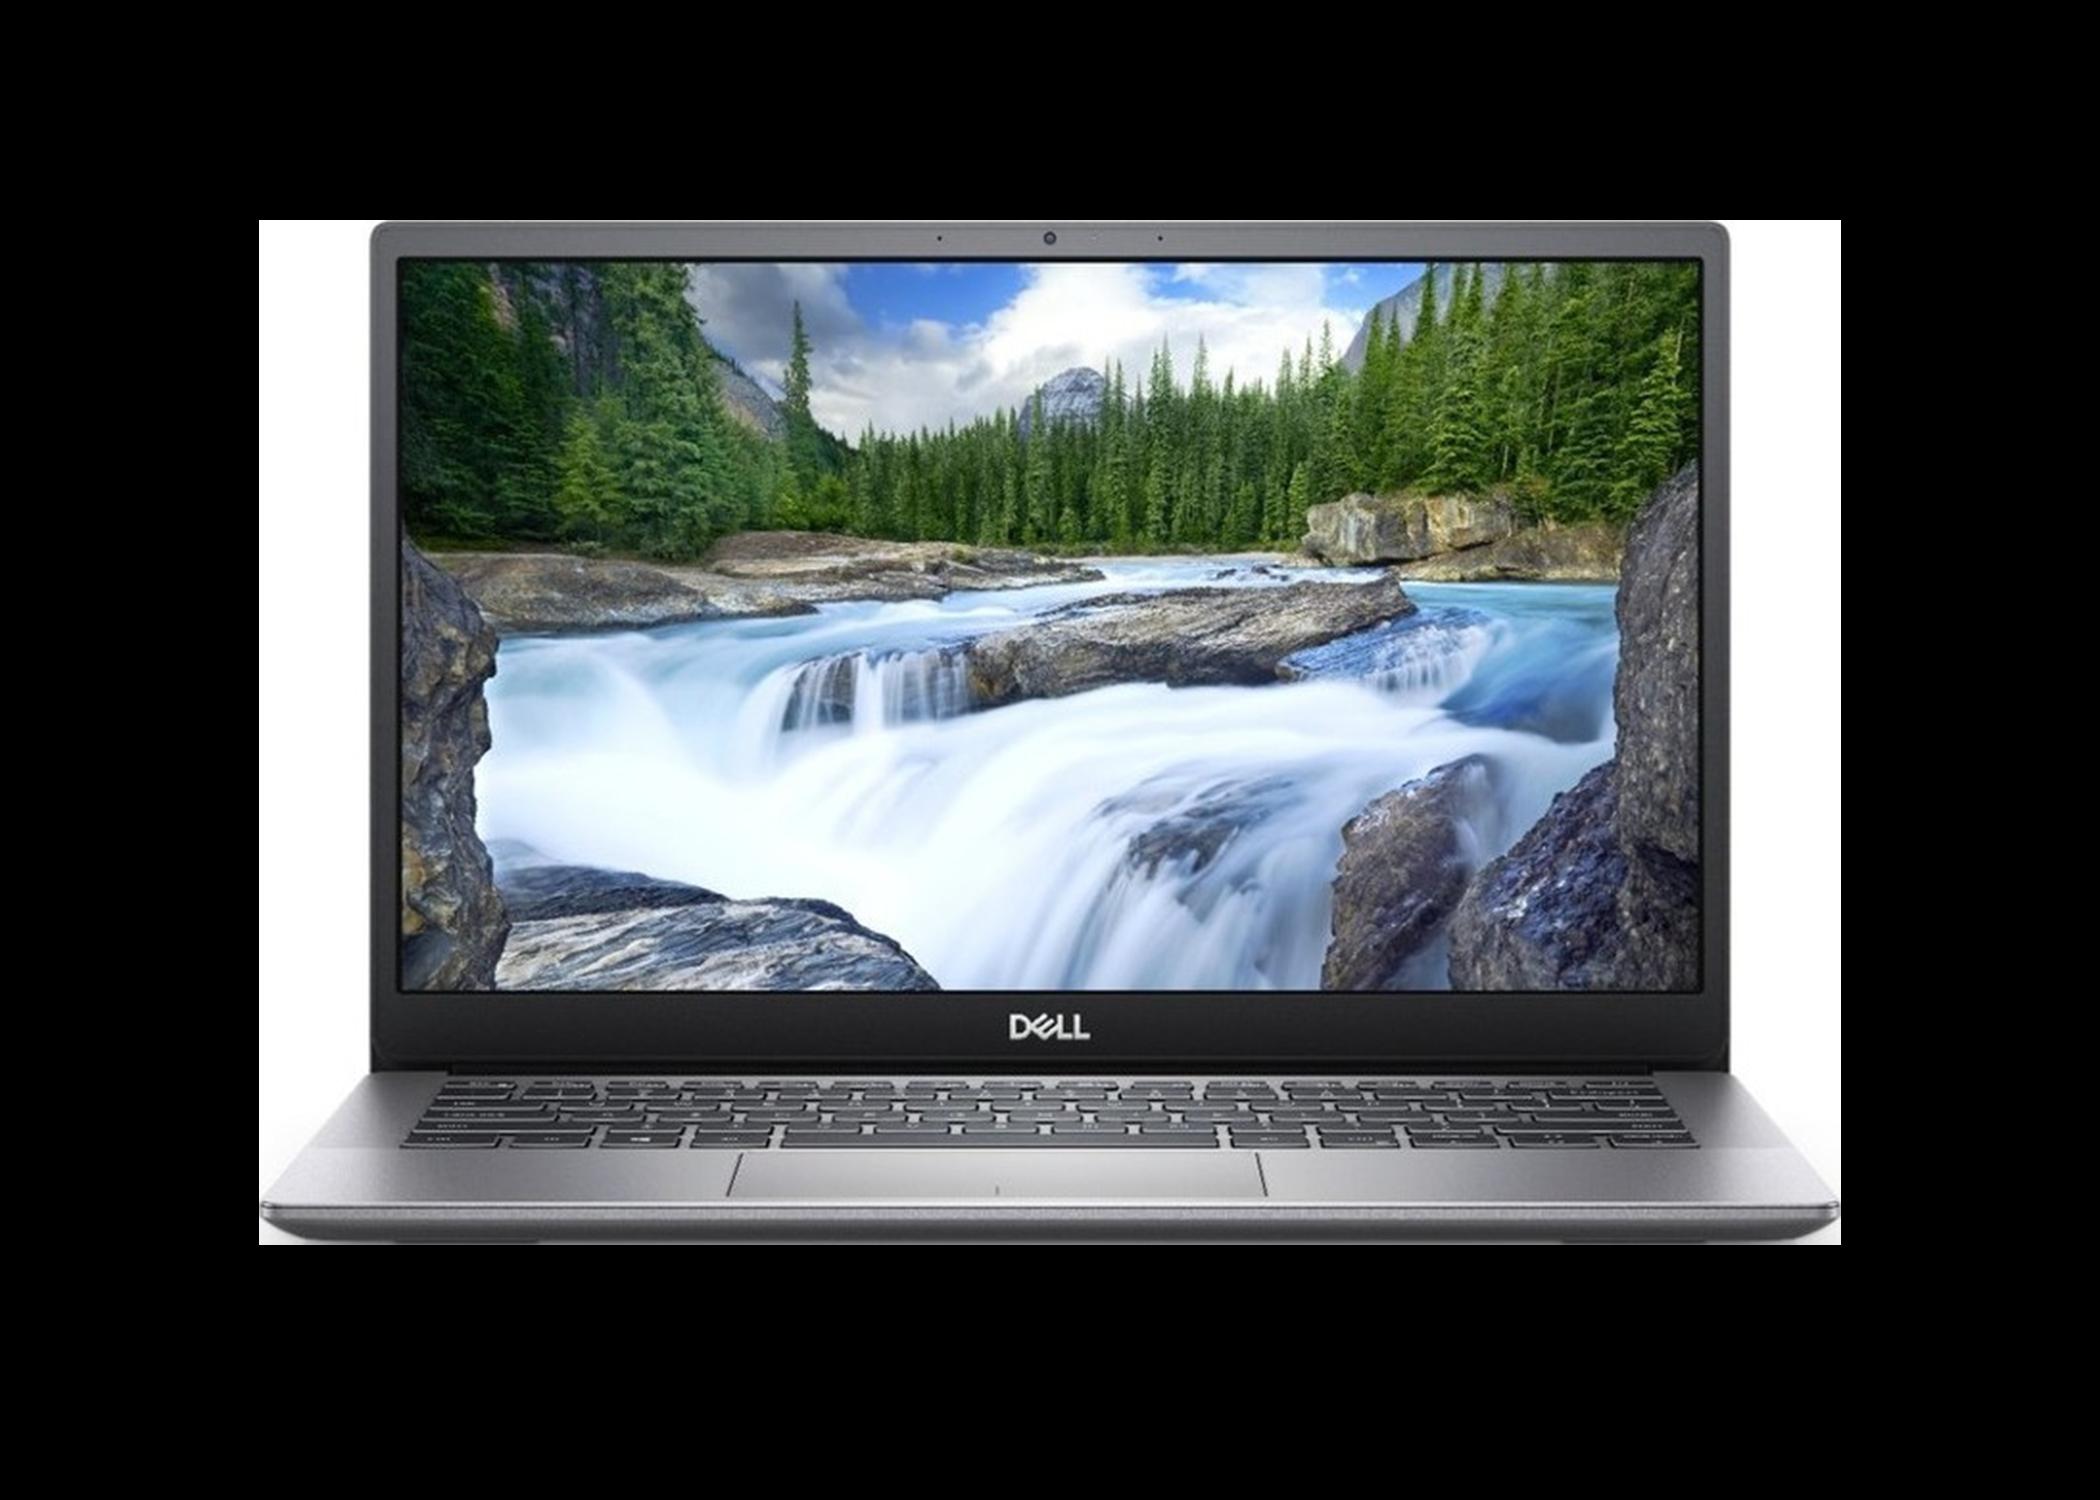 DELL Laptop LAT.3301